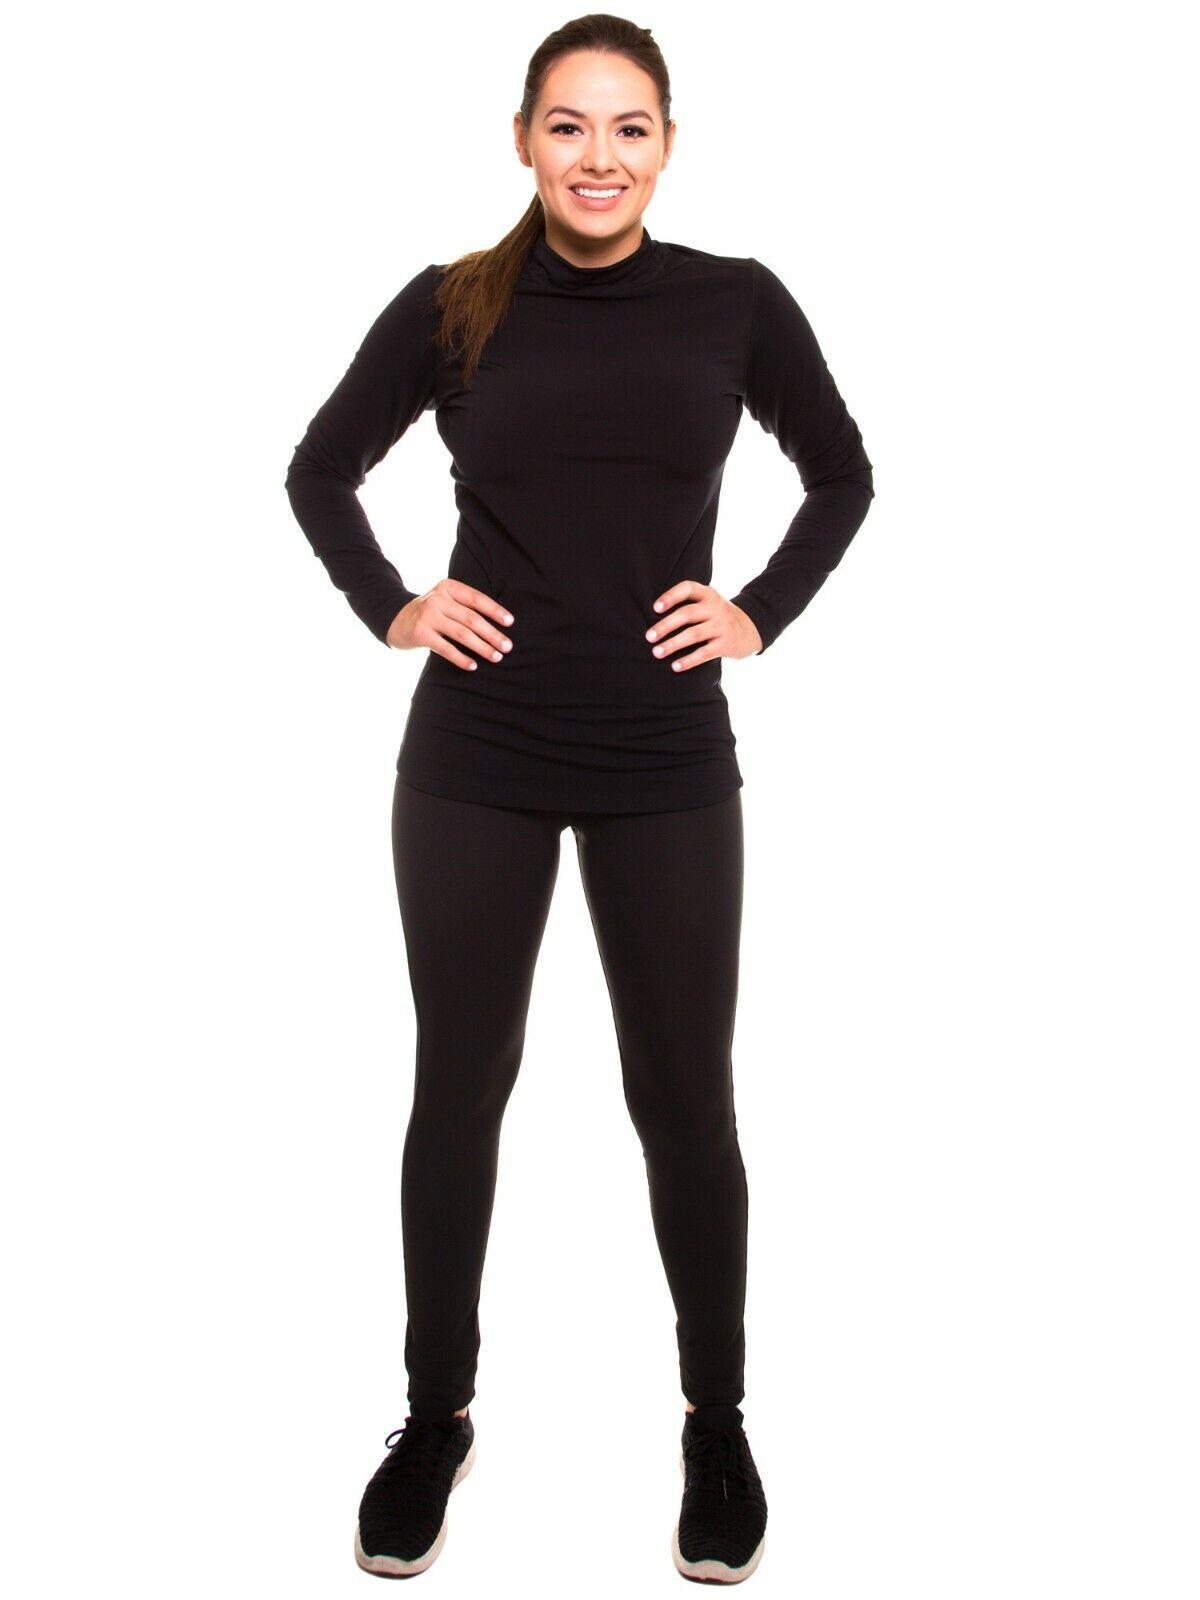 Wouomo Winter Fleeced Yoga Running Workout Pants HighWaist Leggings LL2